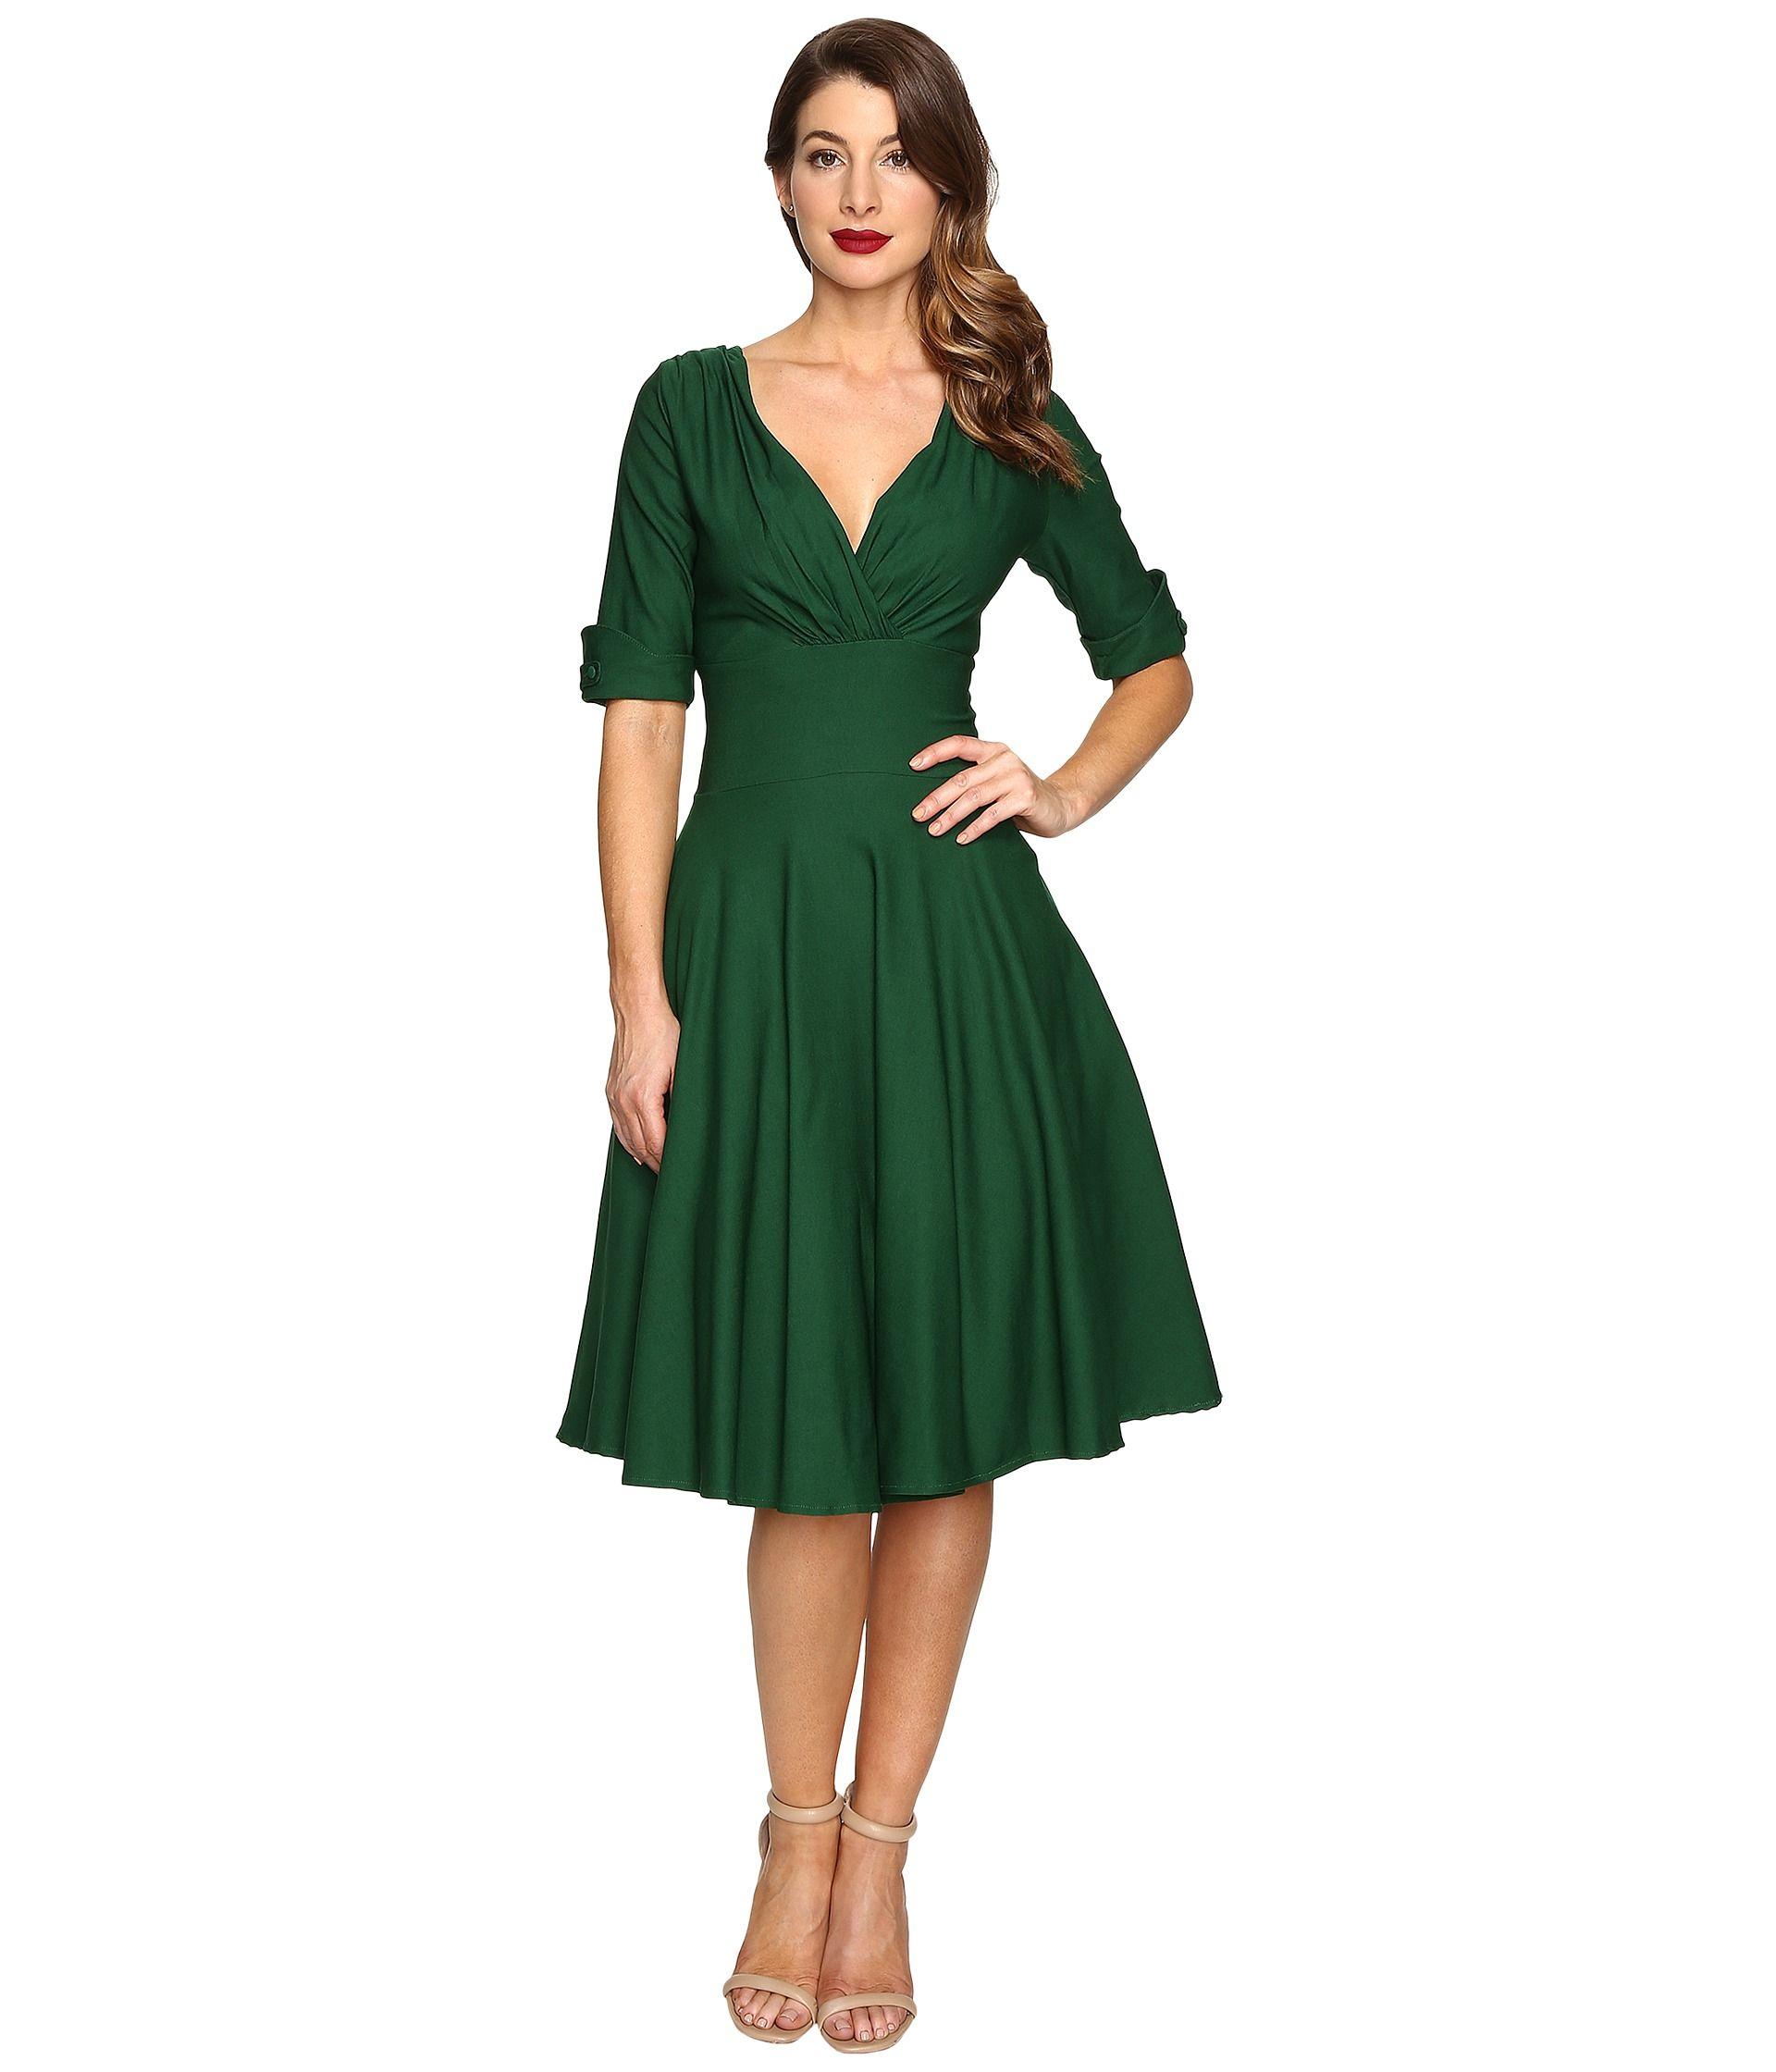 Green dress for wedding  Cora Skinner  Zappos   cora skinner  Pinterest  Unique vintage